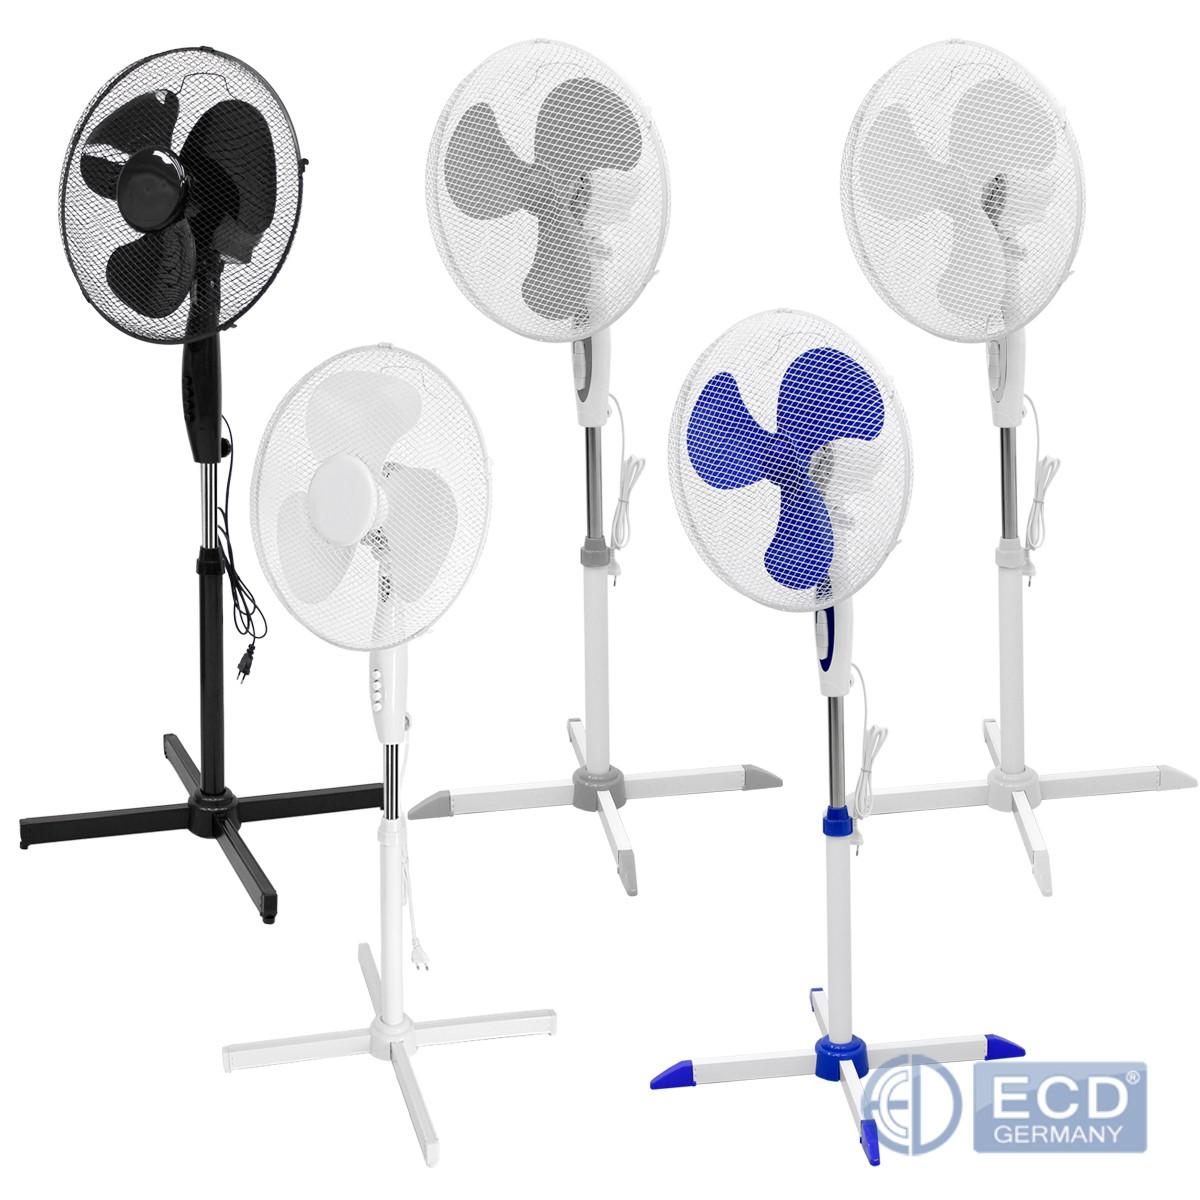 Indexbild 2 - Standventilator Säulenventilator Ventilator Turmventilator Windmaschine Lüfter